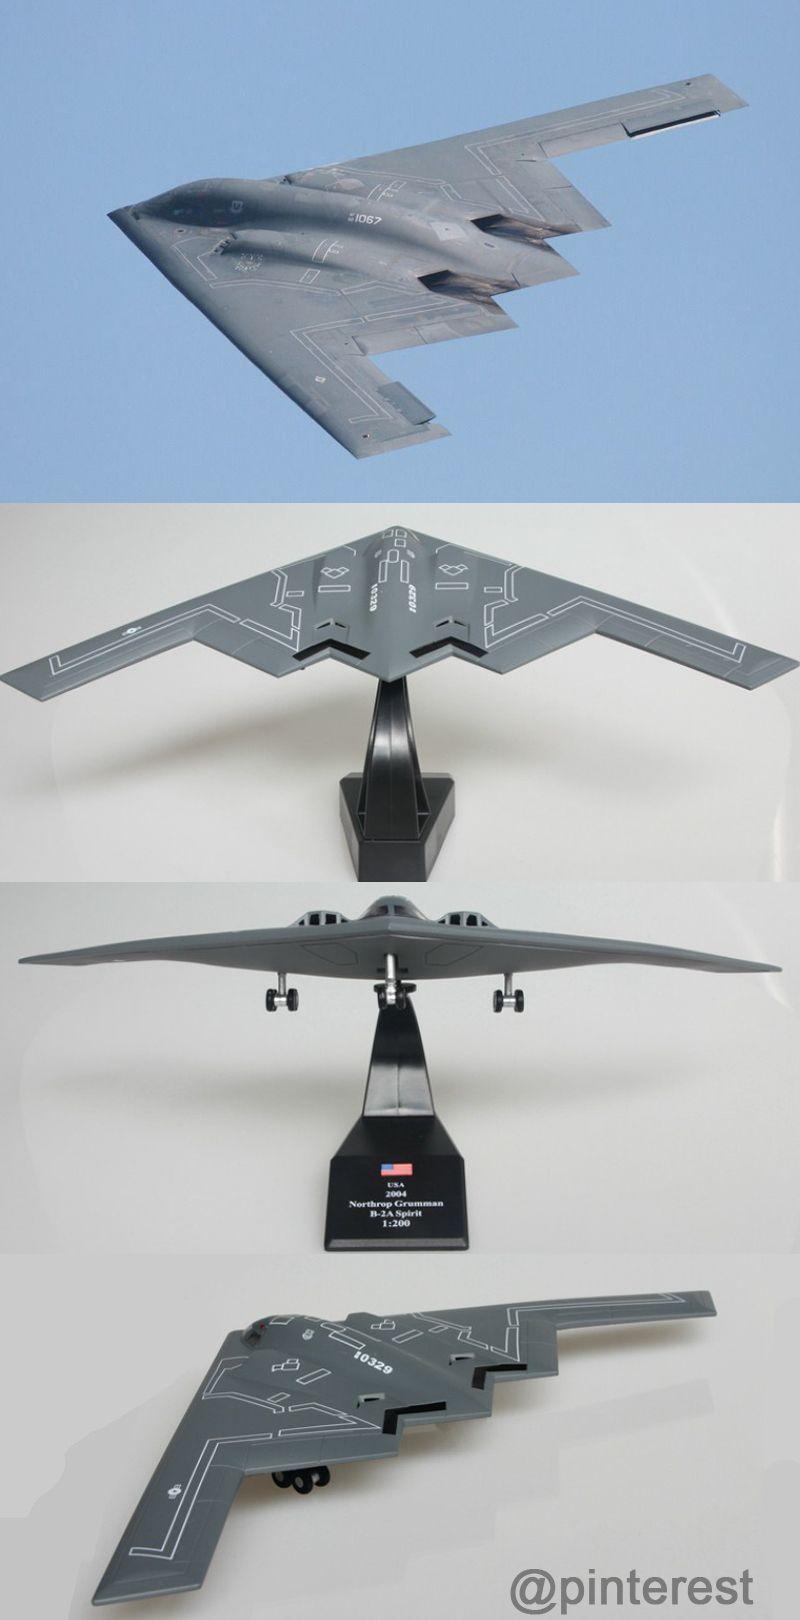 1:200 Scale Military Model Northrop Grumman B-2 Stealth and ...